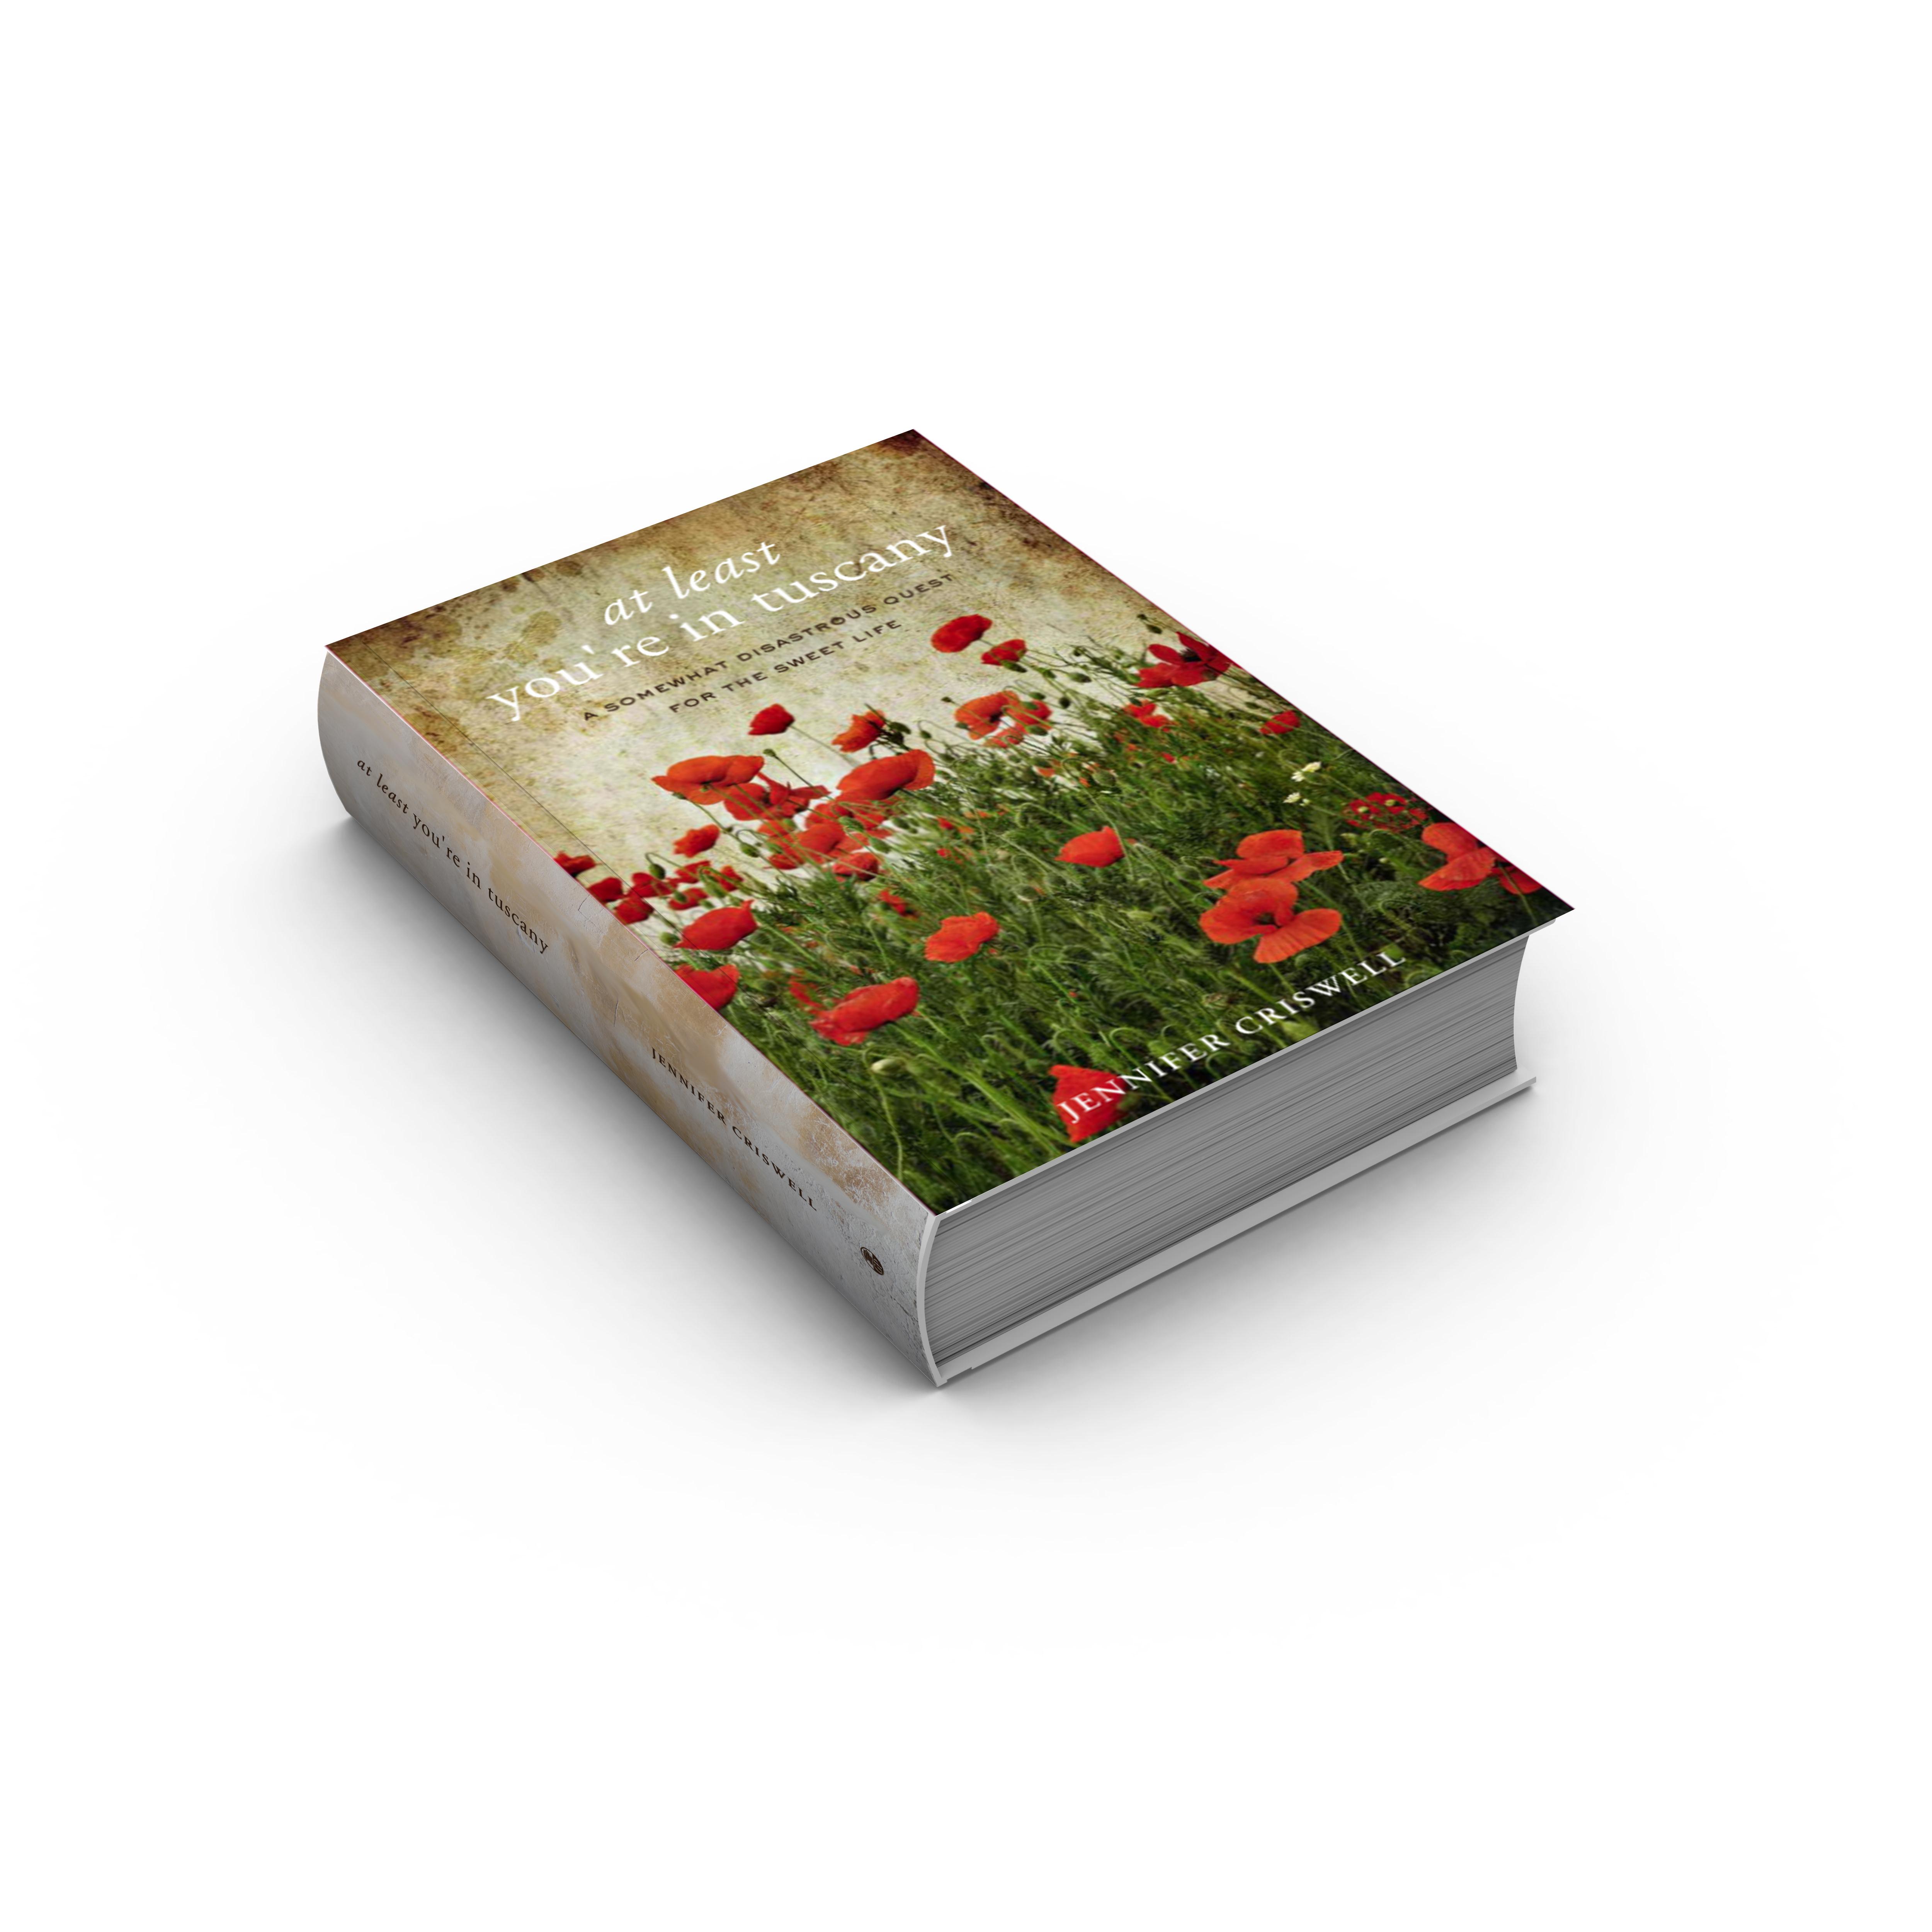 ALYT book